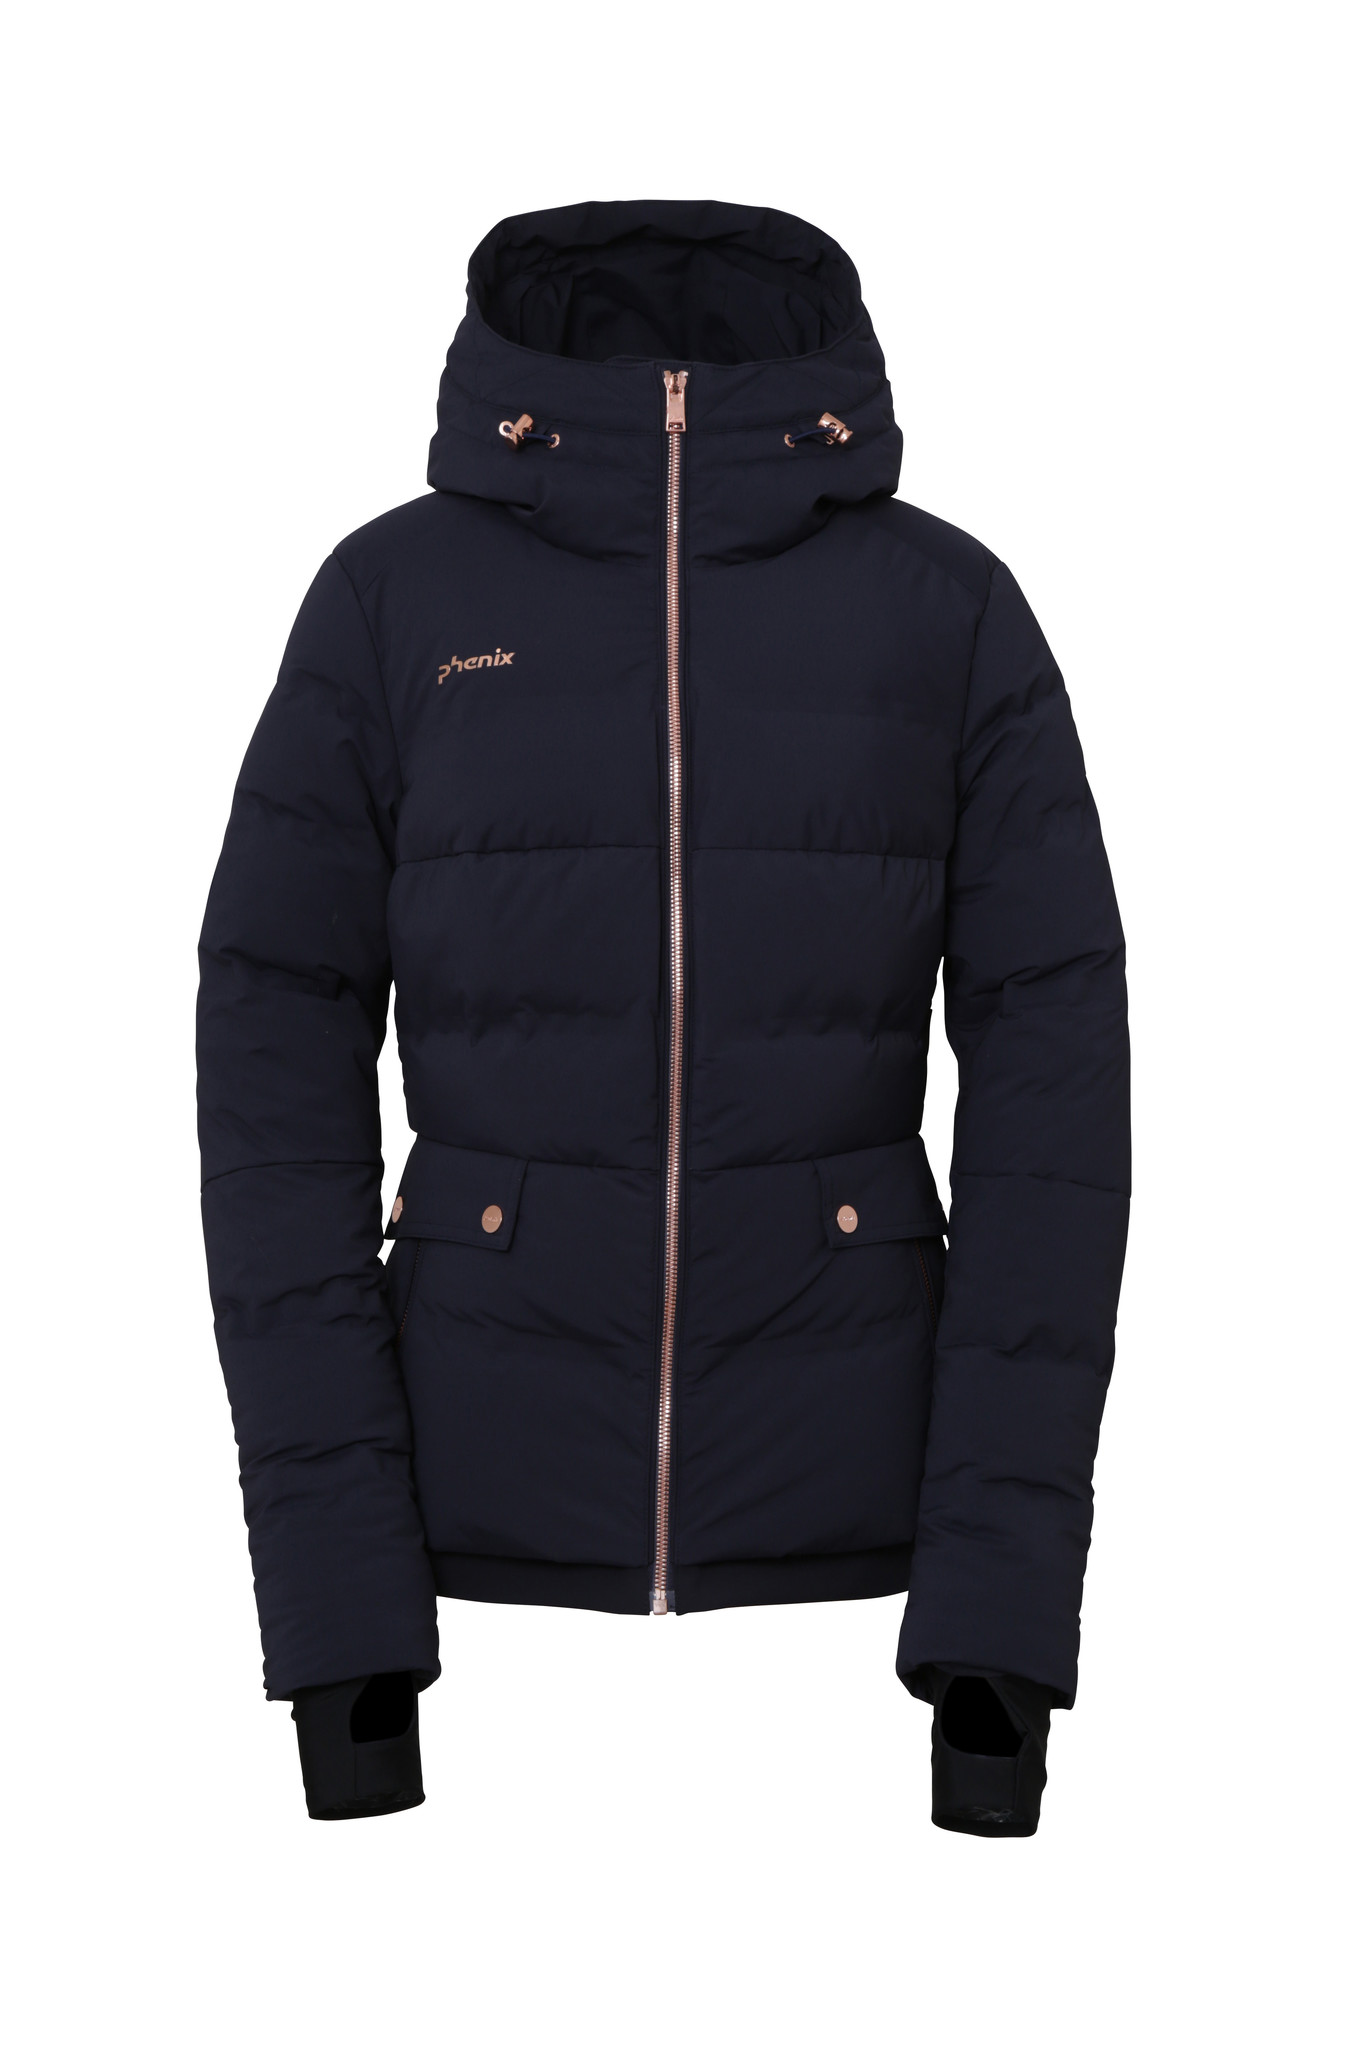 phenix Garnet Down Jacket